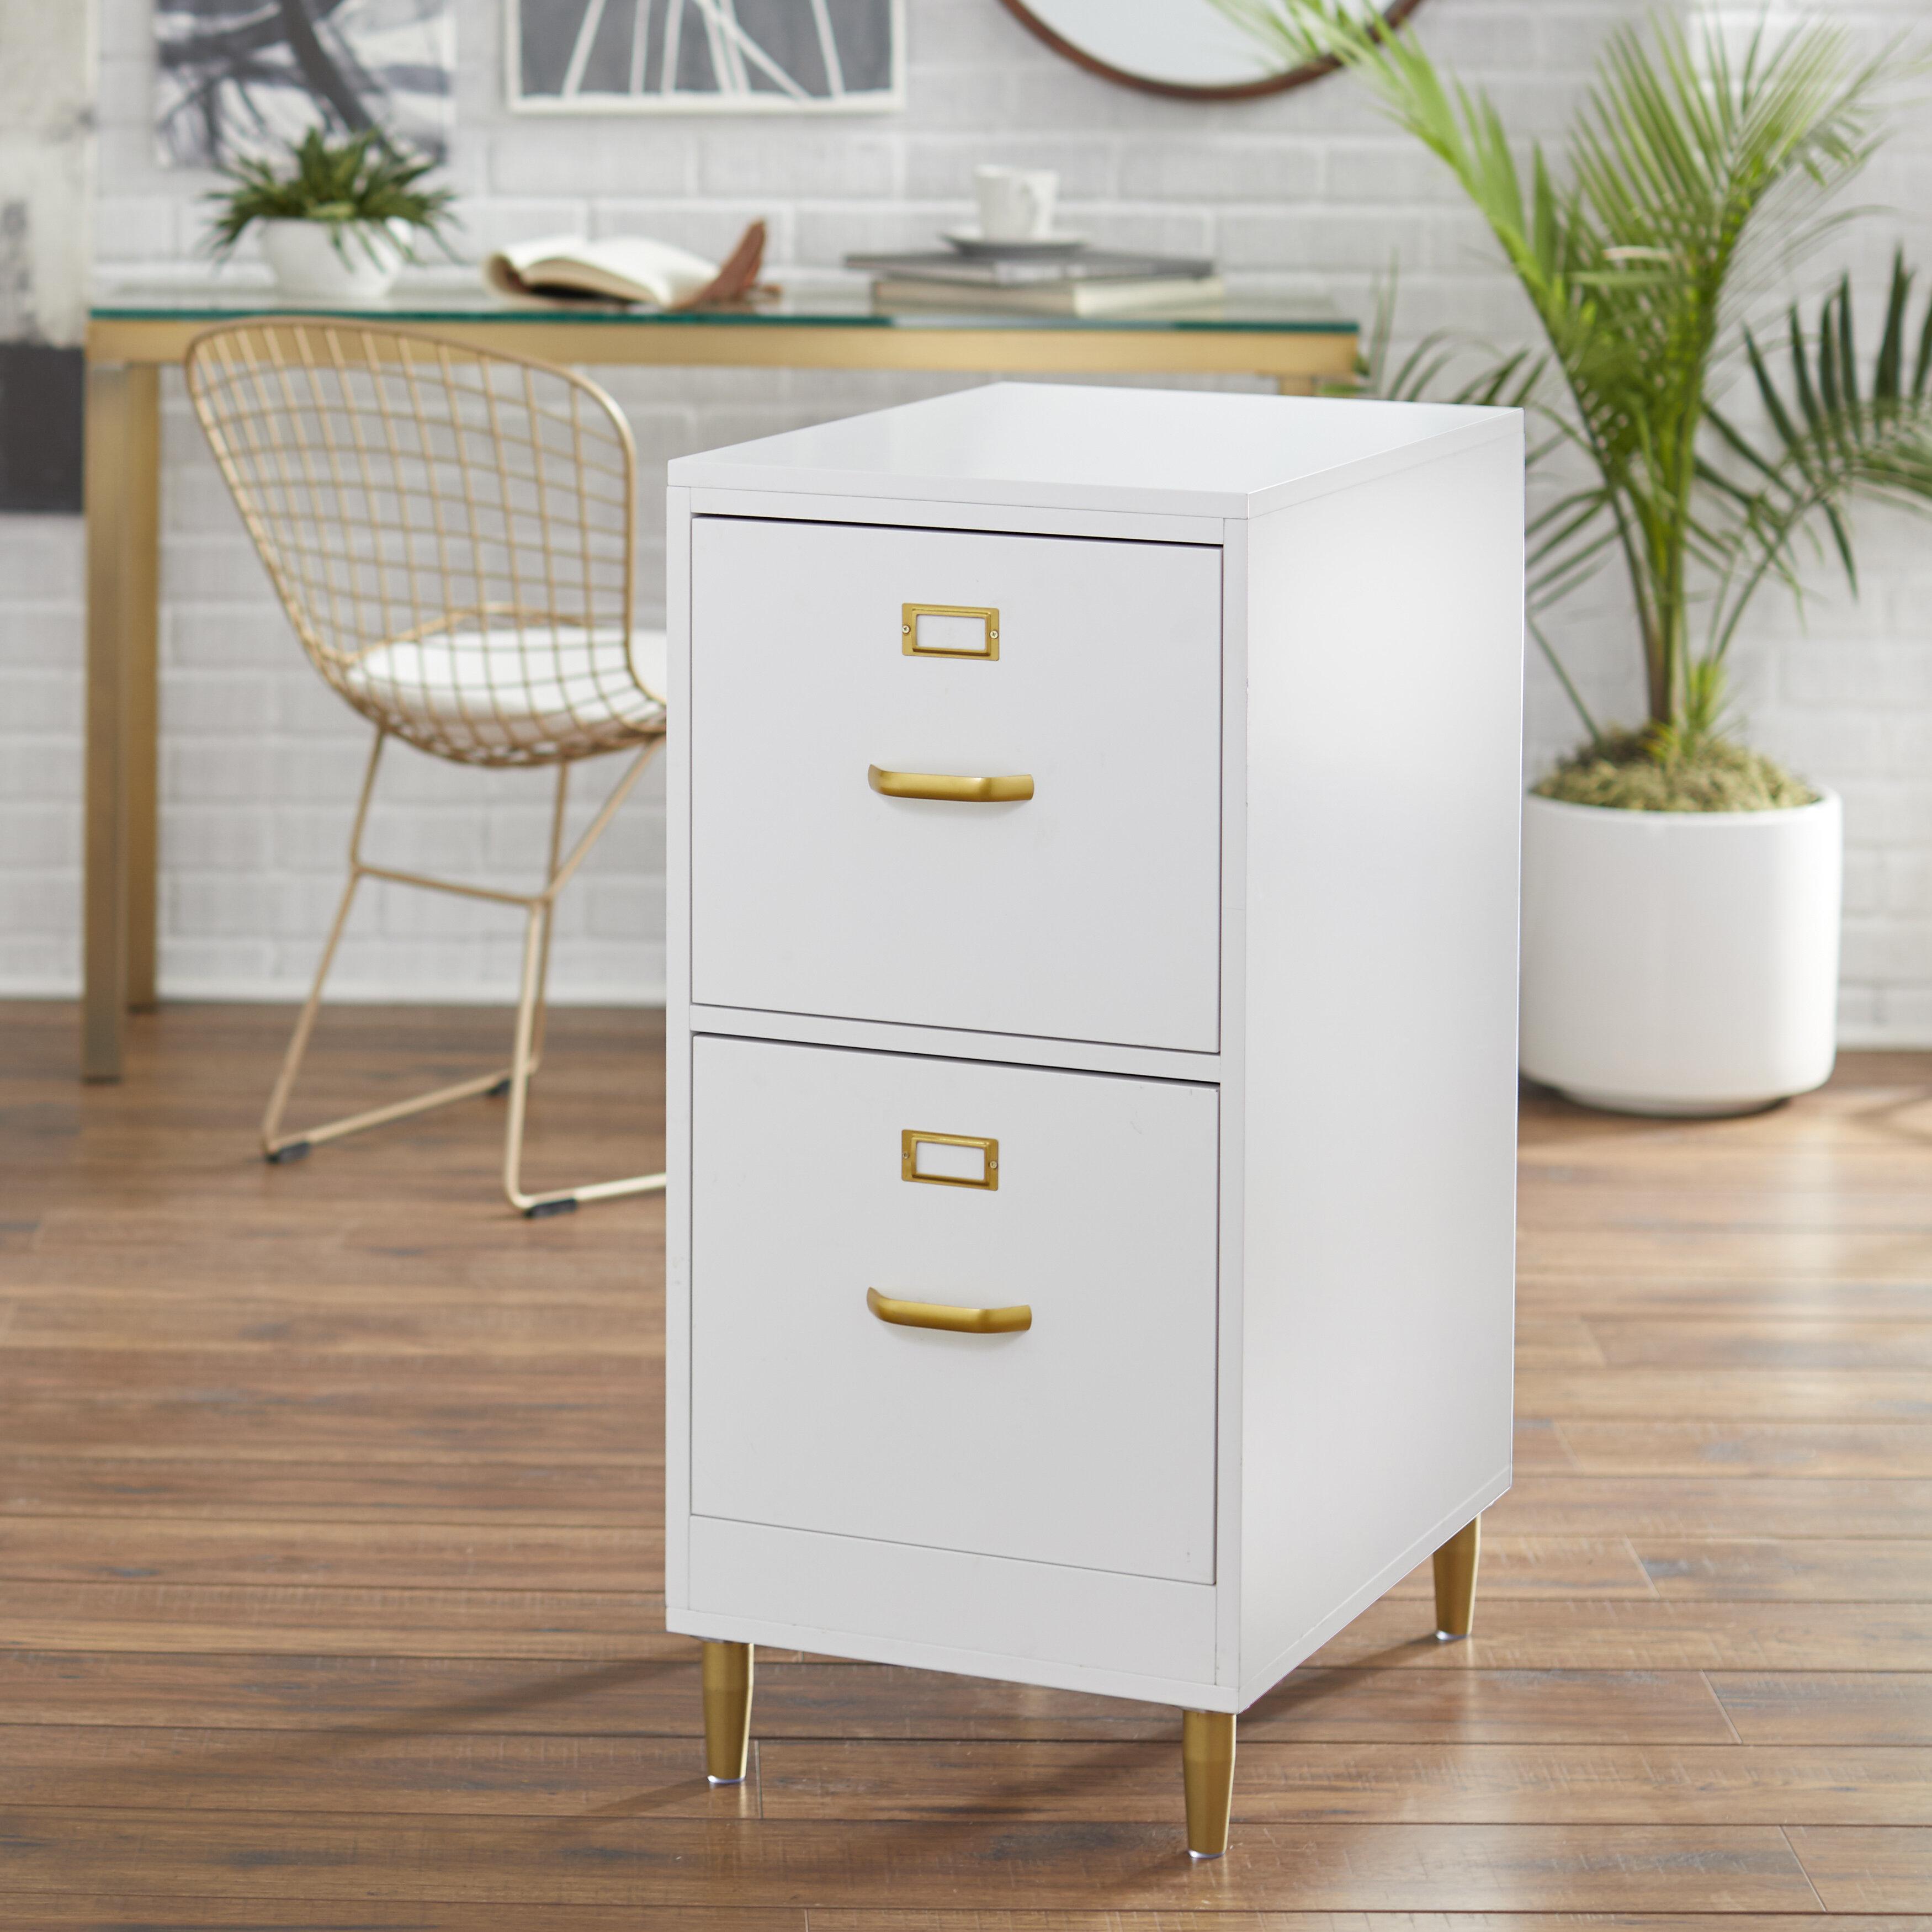 Mercer41 Dahle 2 Drawer File Cabinet Reviews Wayfair